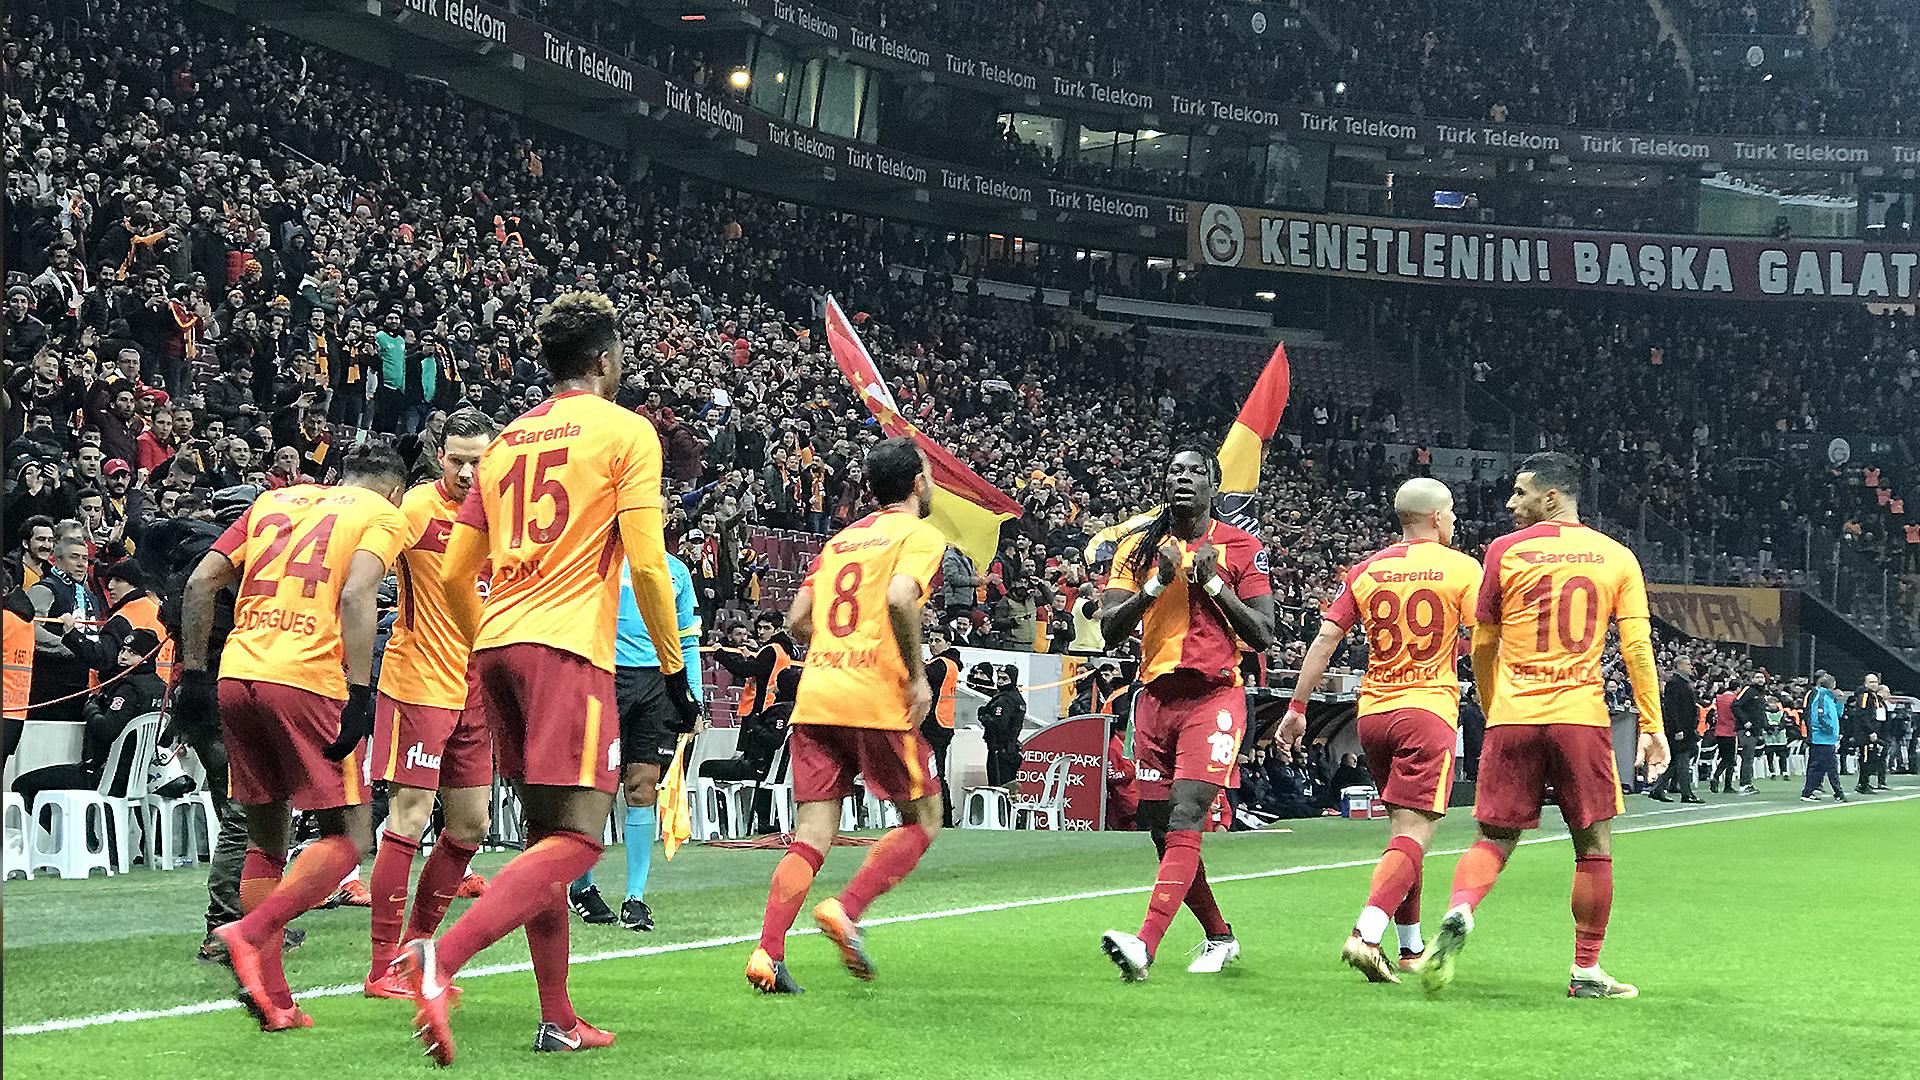 Galatasaray goal celebration Antalyaspor 02122018